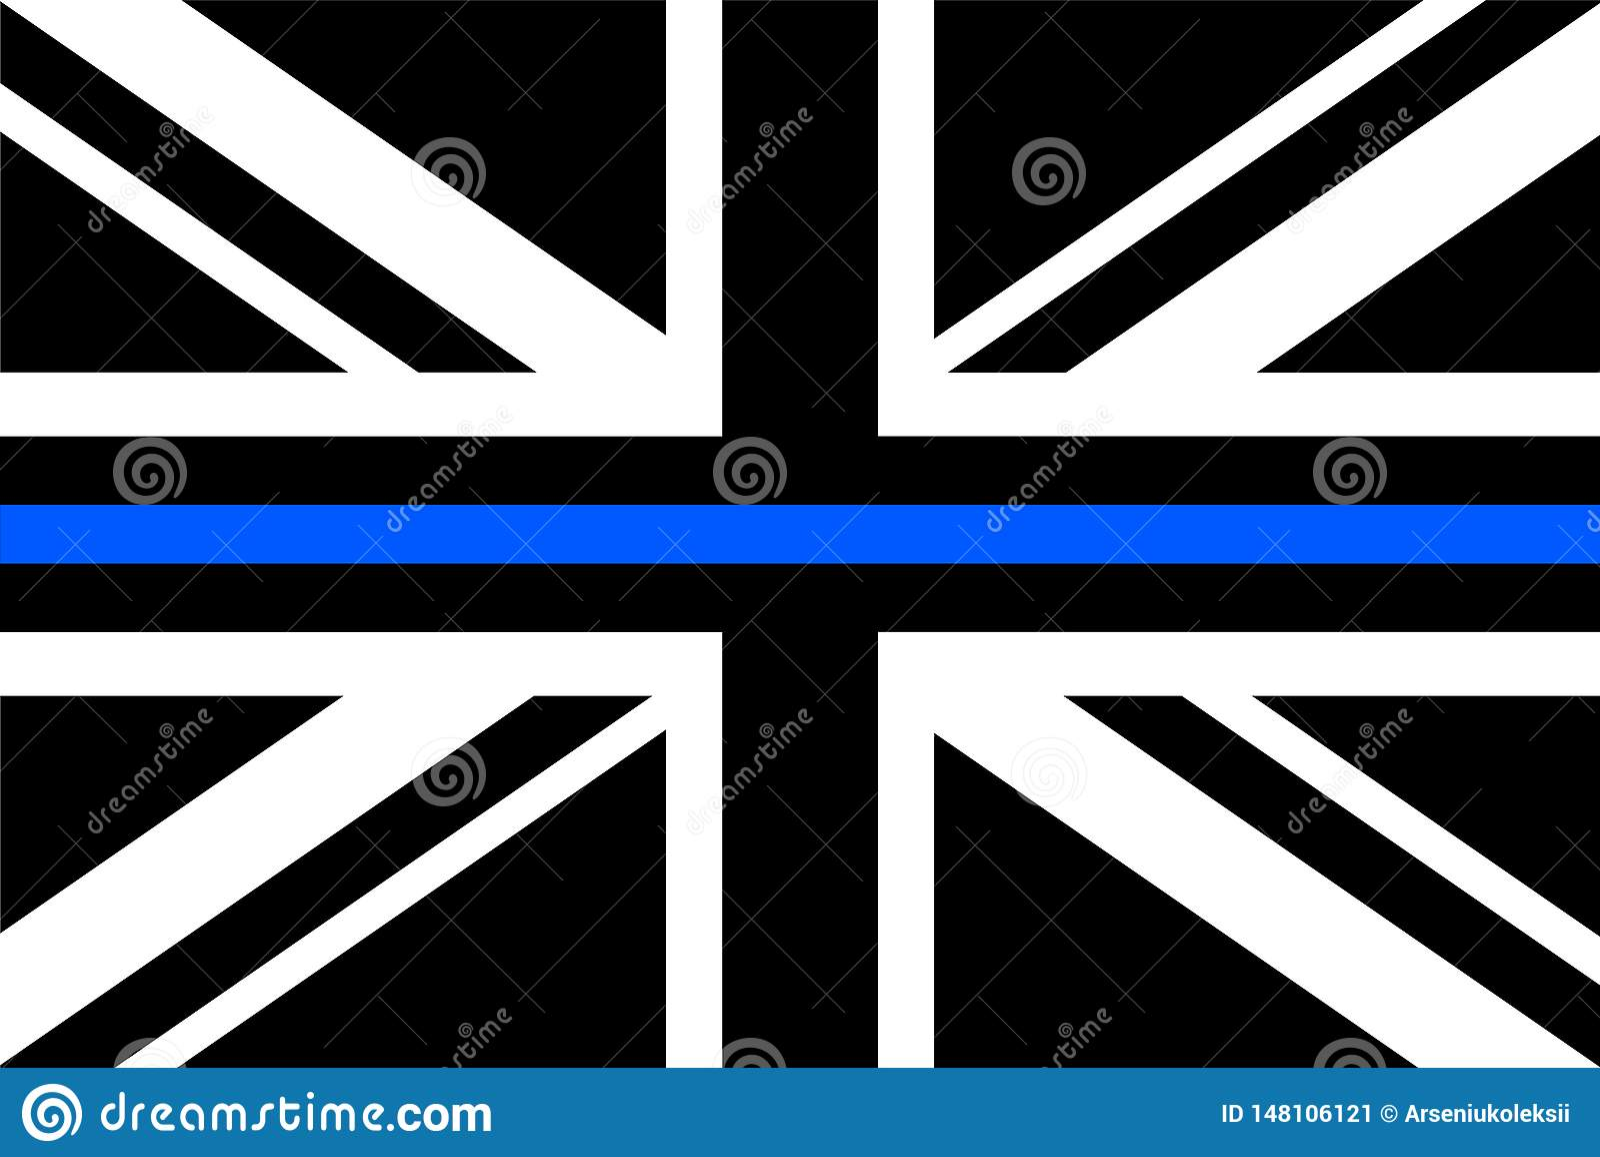 United Kingdom flag a with thin blue line